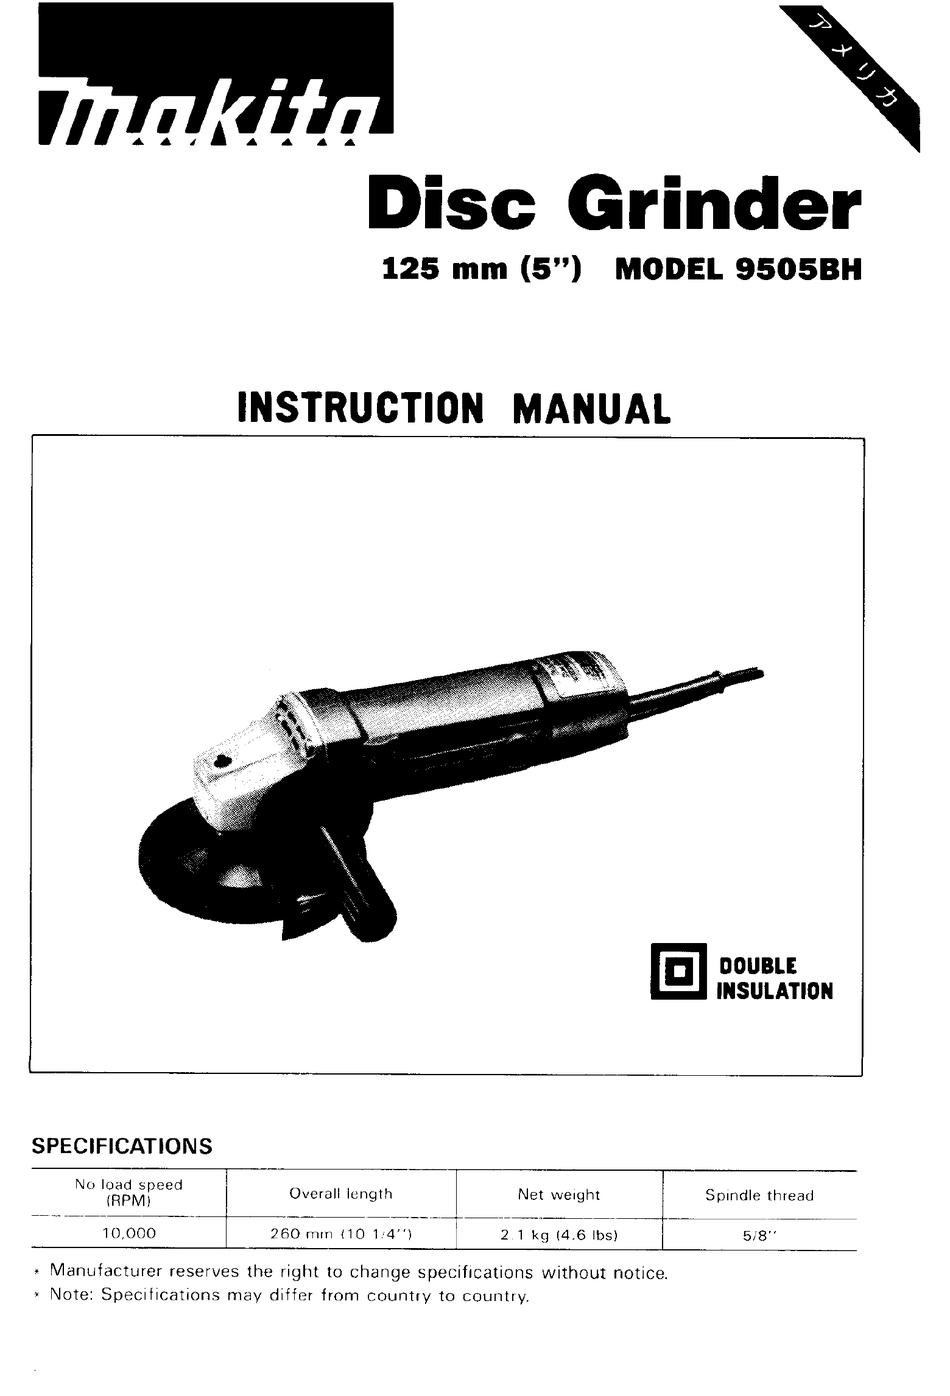 MAKITA DISC GRINDER 9505BH INSTRUCTION MANUAL Pdf Download